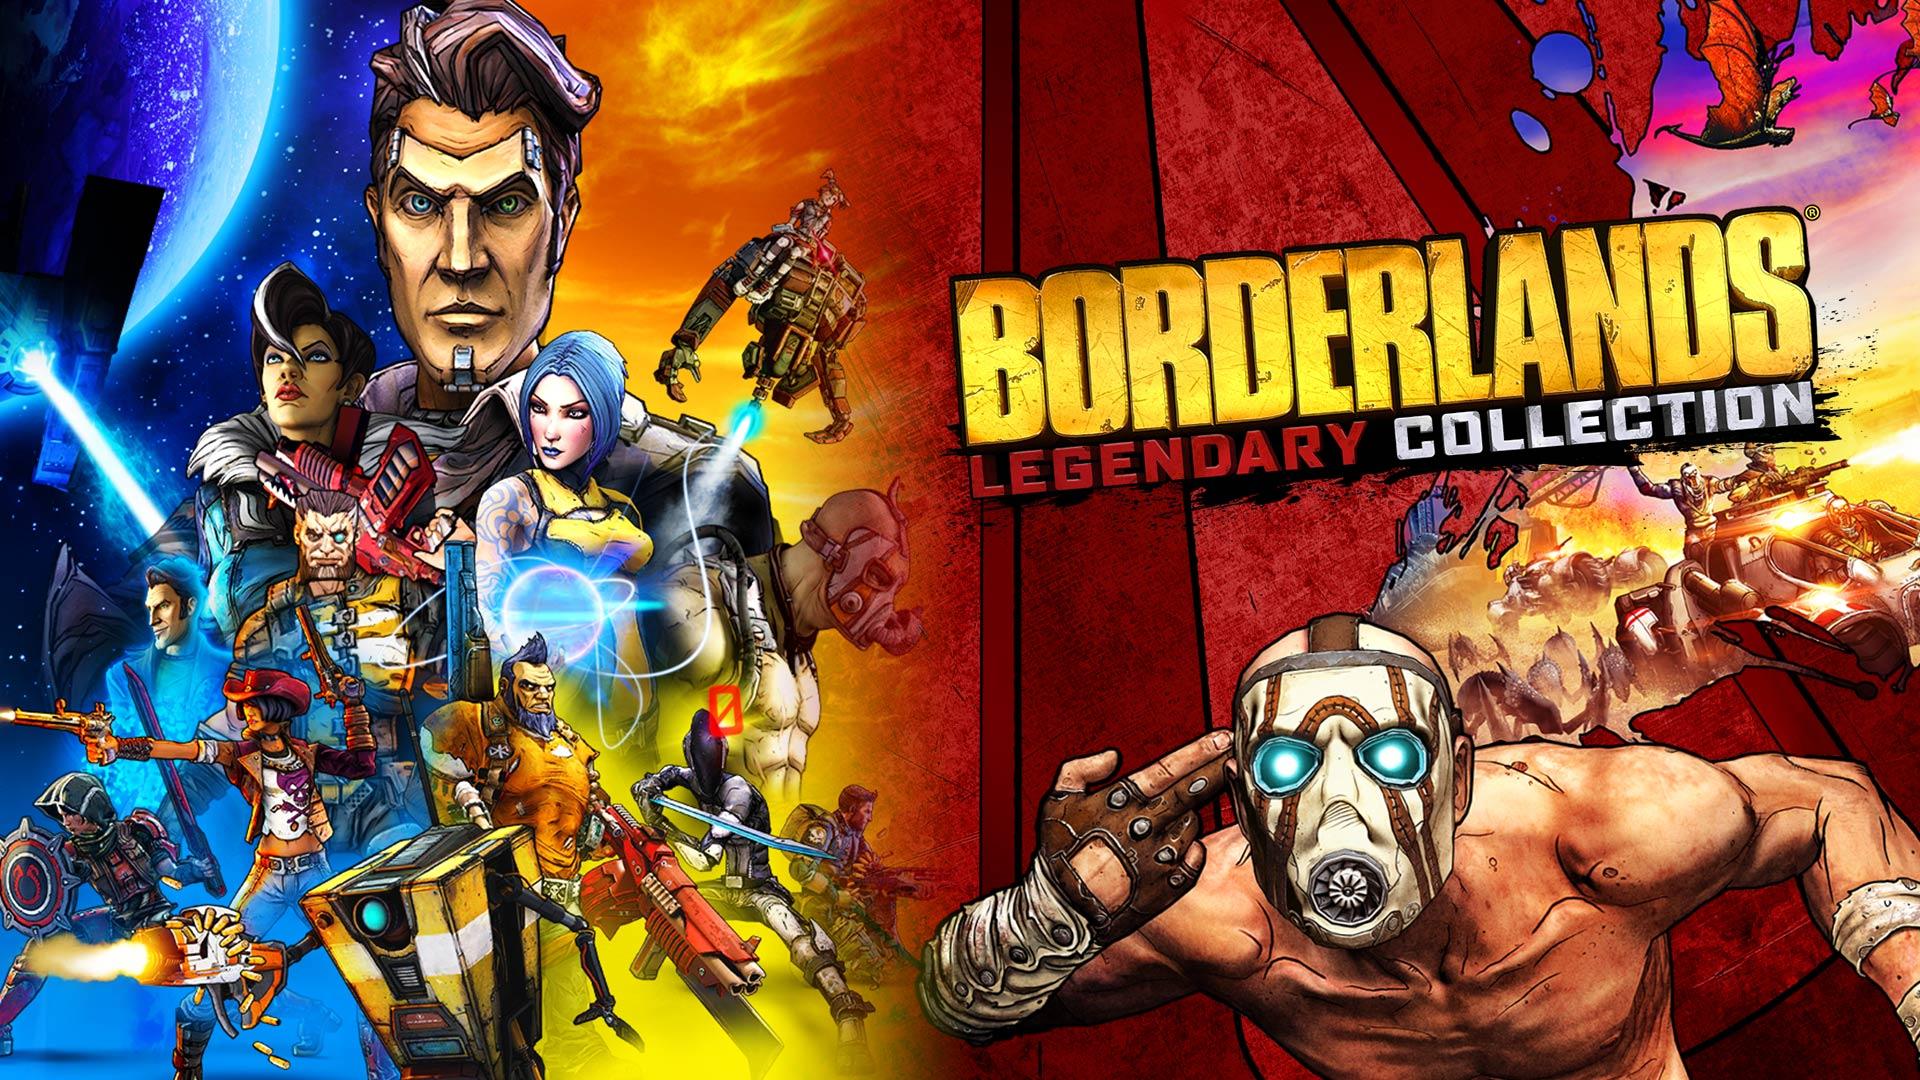 Nintendo Eshop: Borderlands Legendary Collection